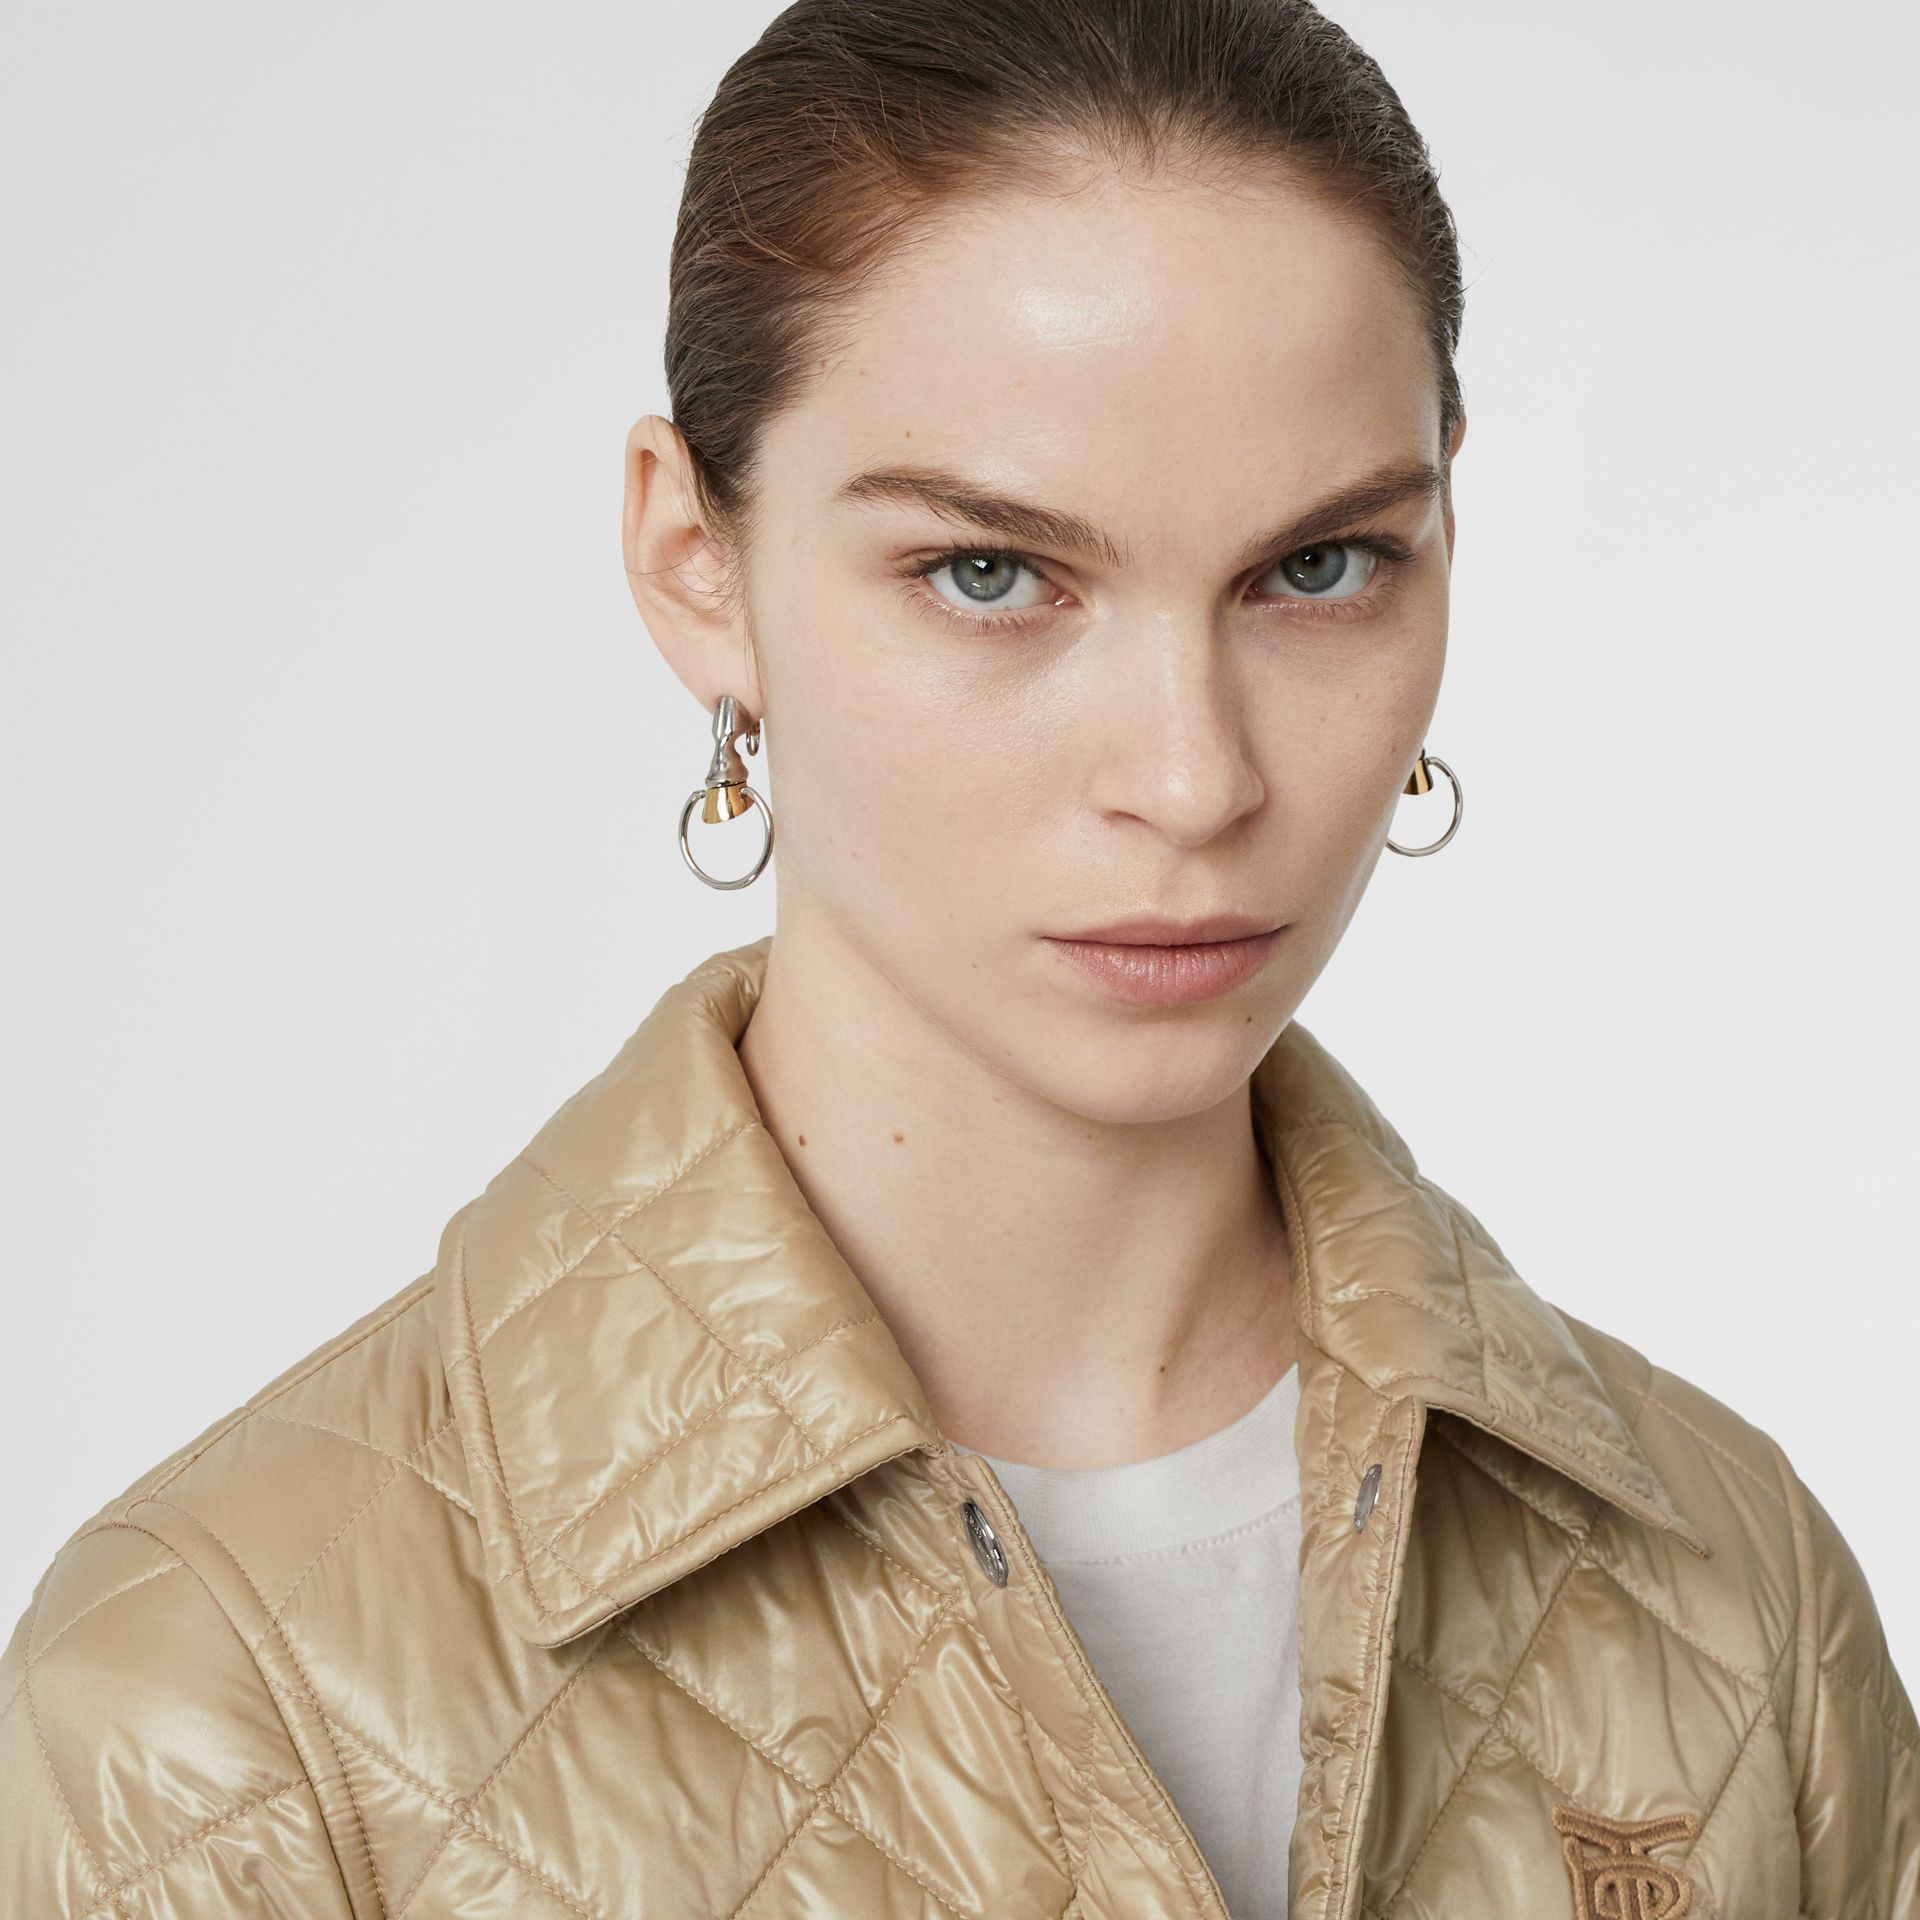 Monogram Motif Diamond Quilted Jacket in Honey - Women | Burberry Hong Kong - gallery image 1